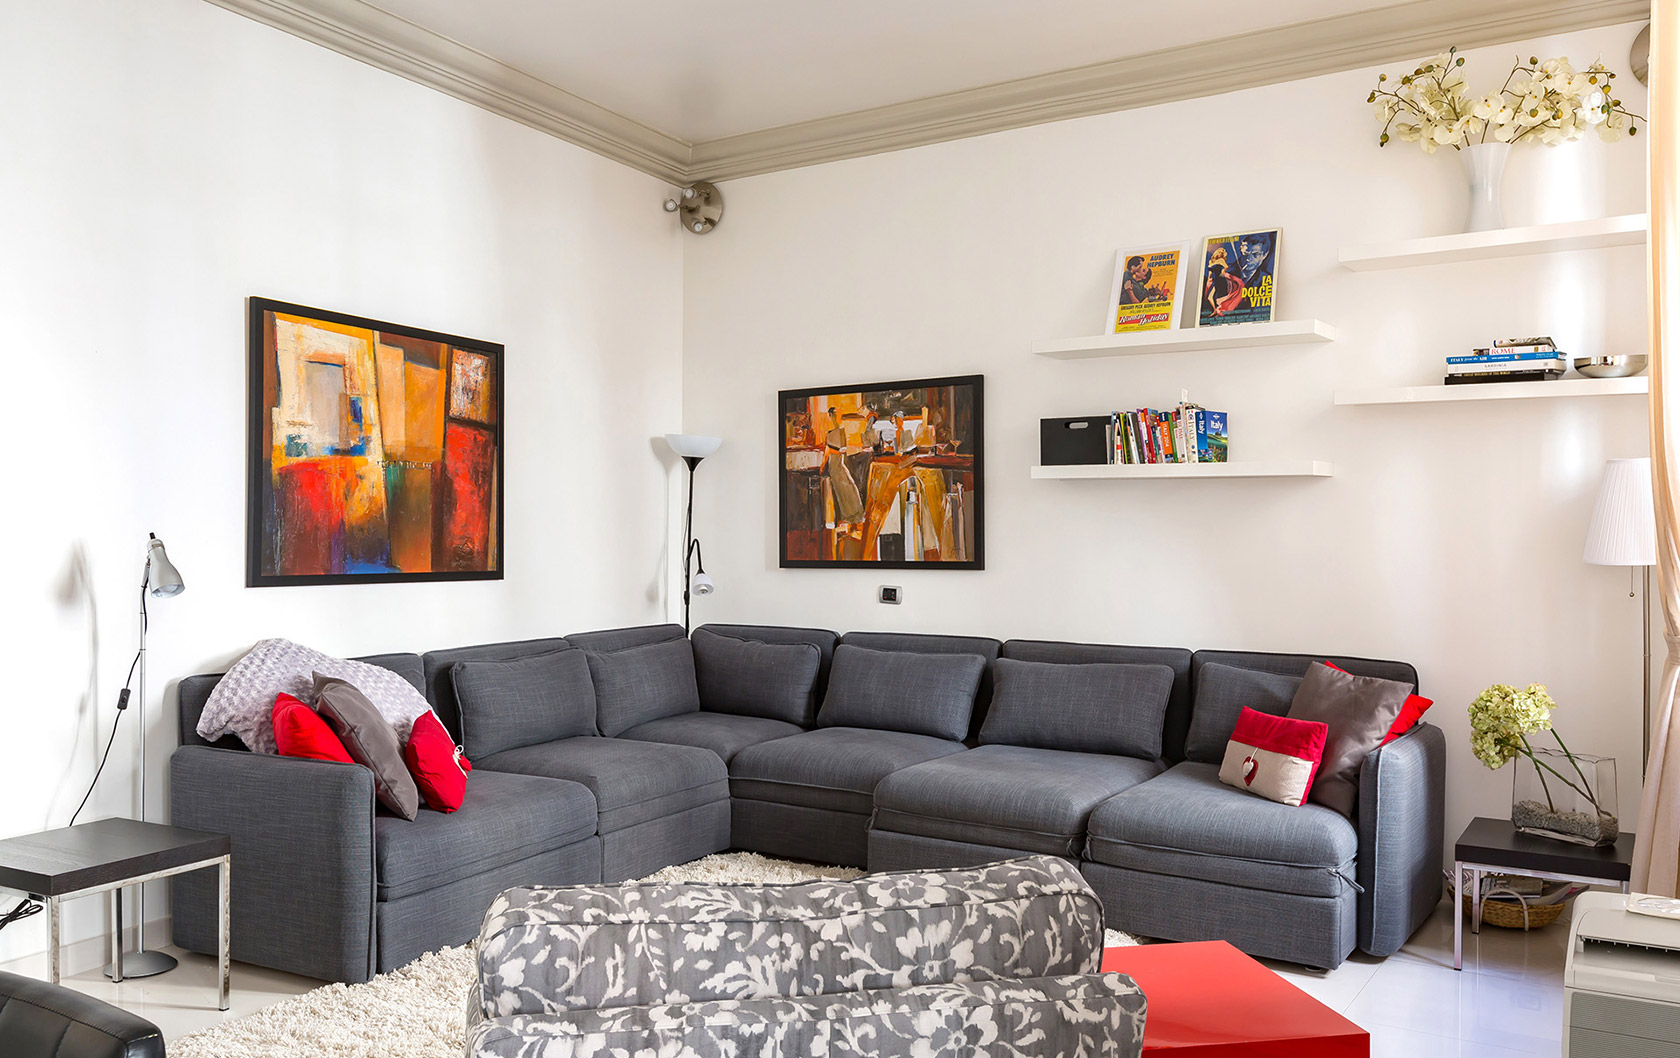 Rome Sabini Apartment Combines Great Location, Modern Conveniences